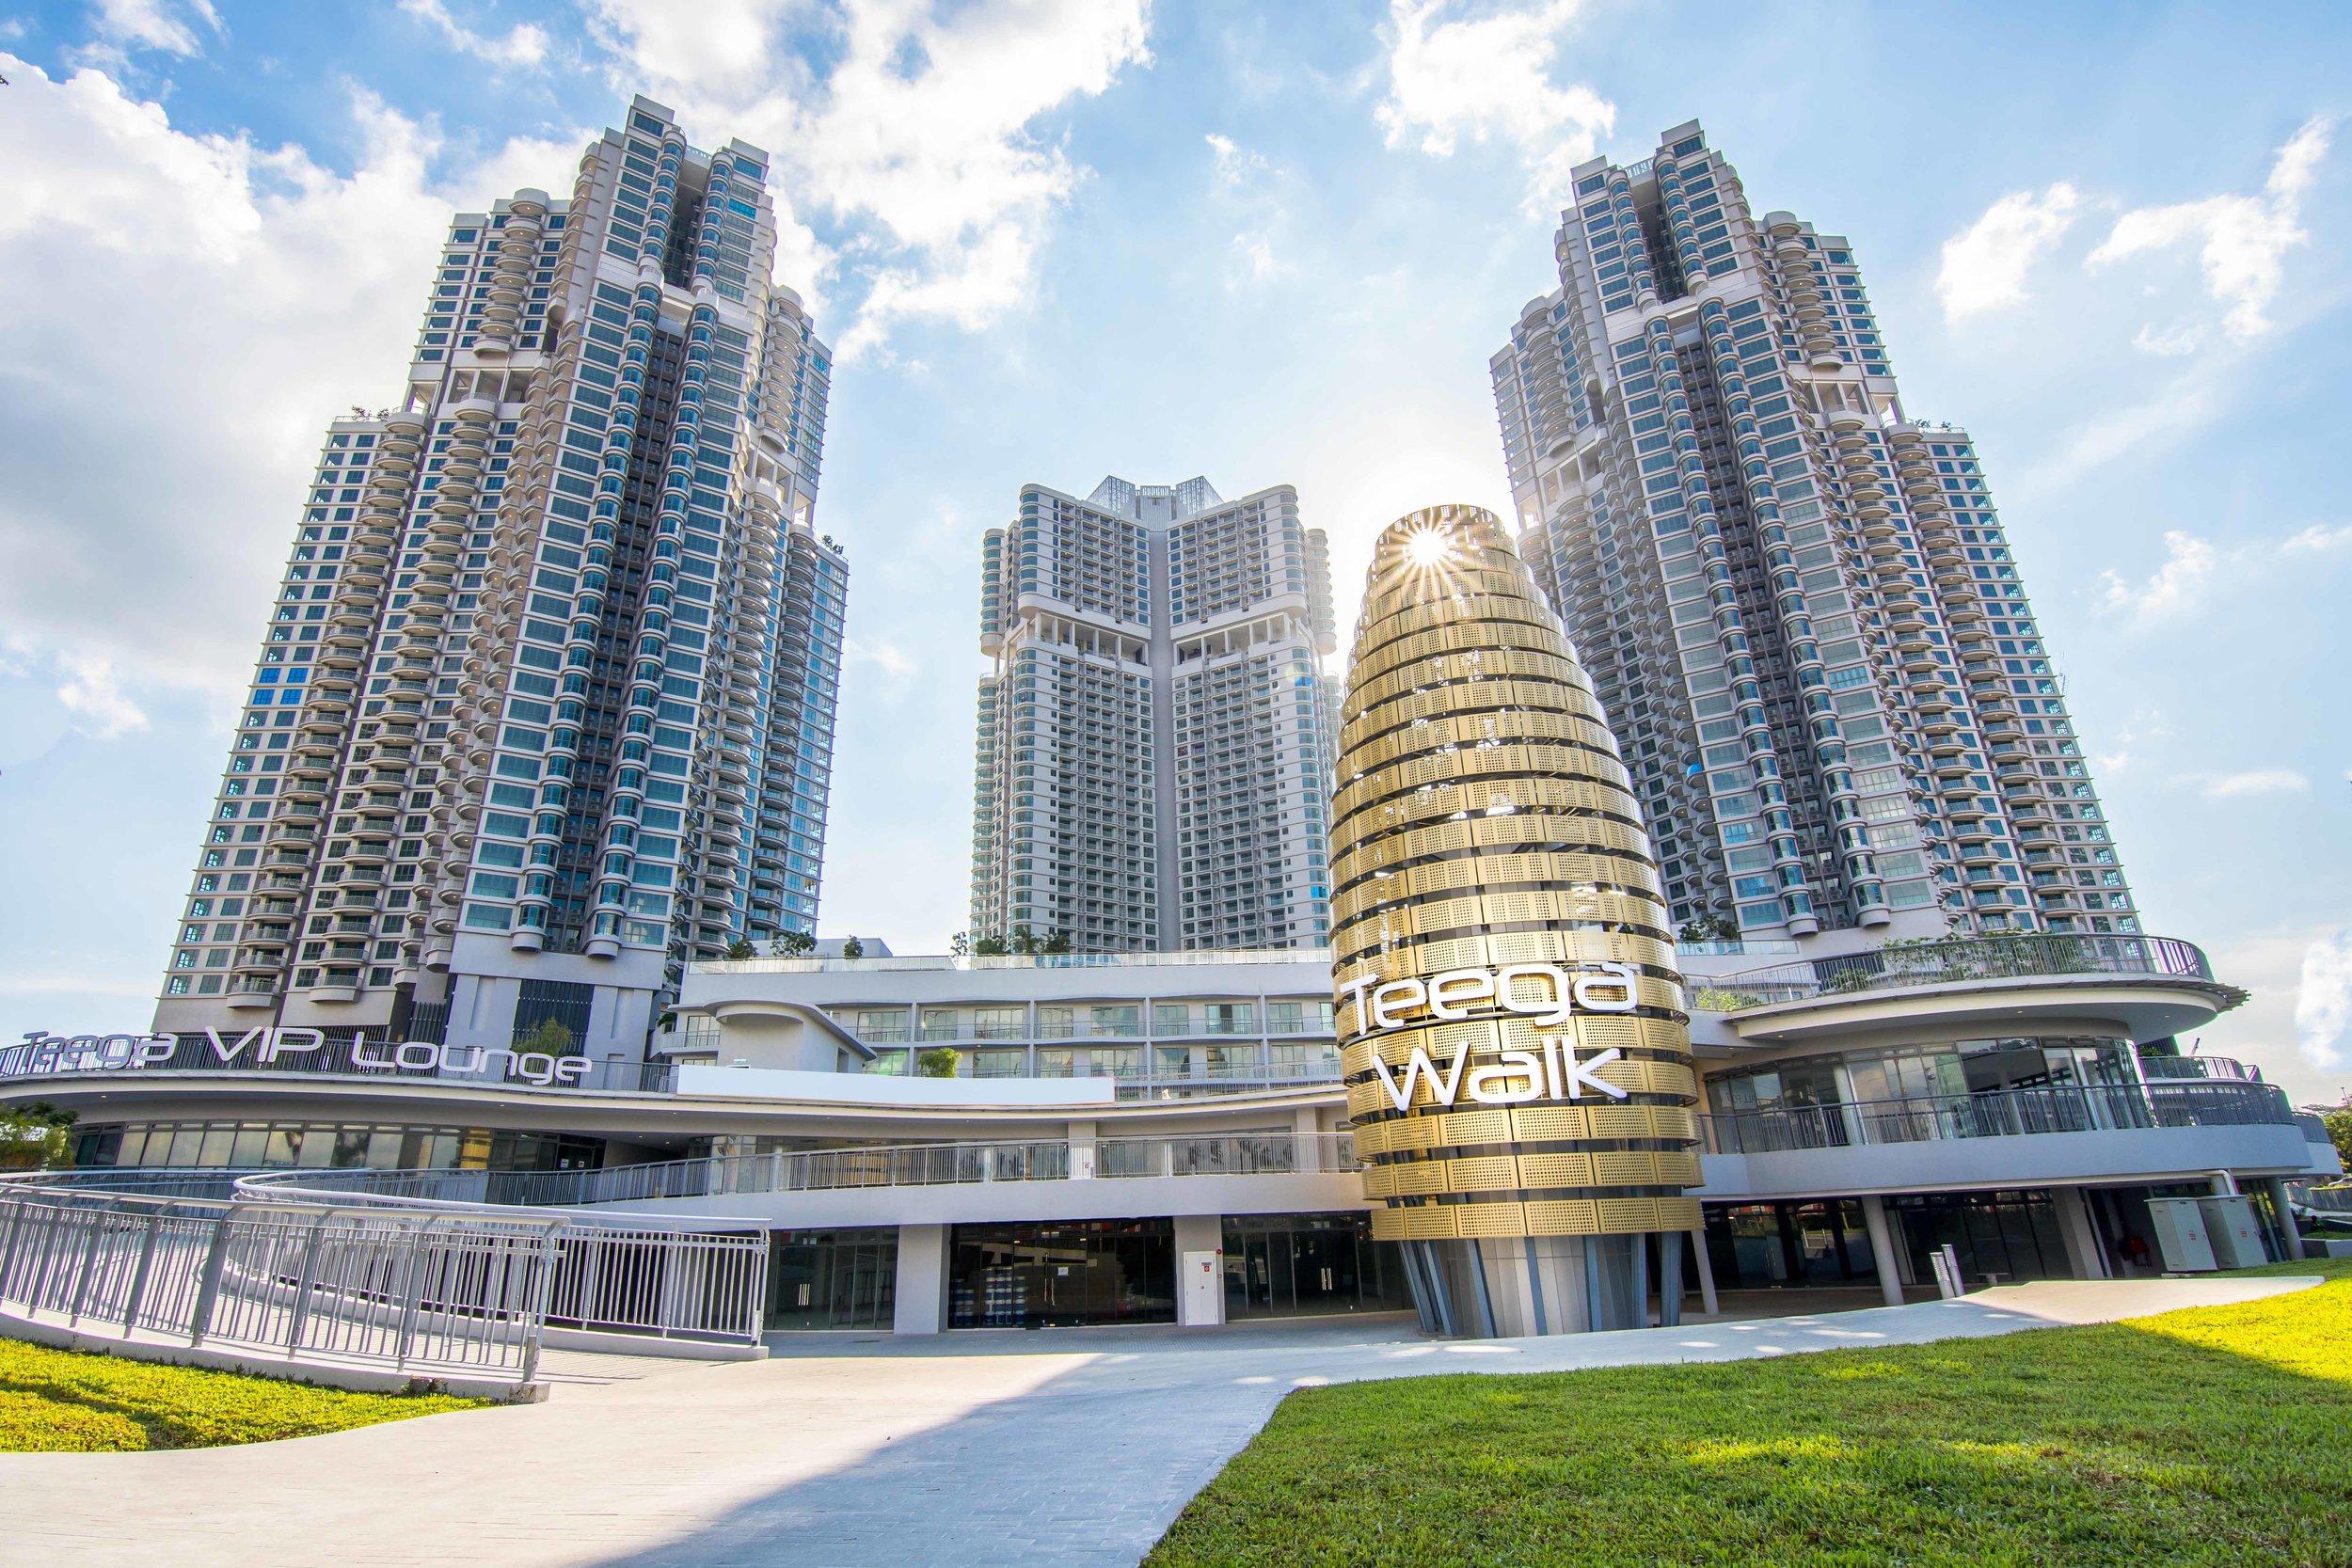 interior-architecture-photography-singapore-21.jpg